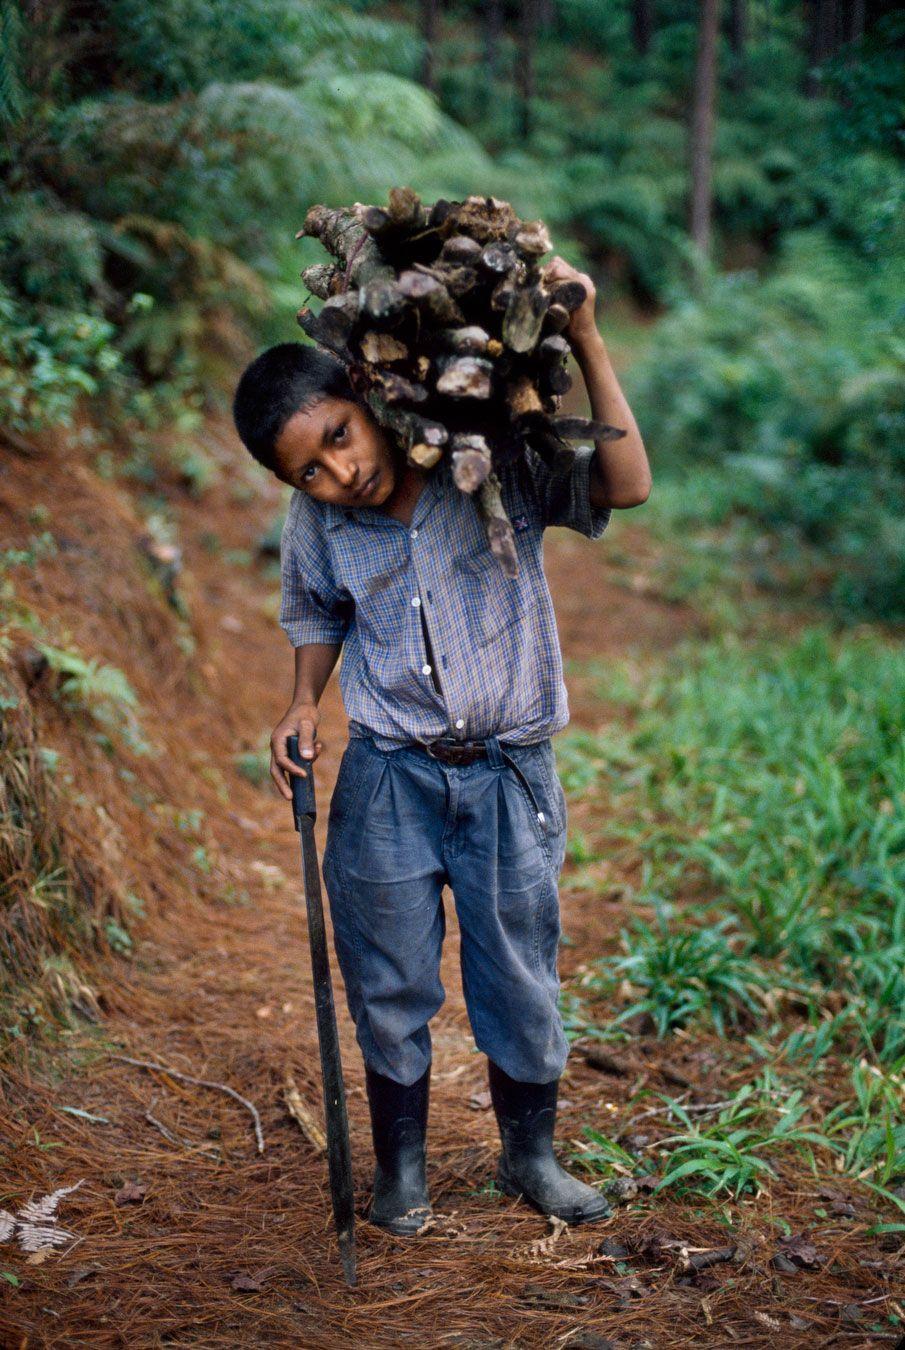 Children | Steve McCurry http://stevemccurry.com/galleries/children-0